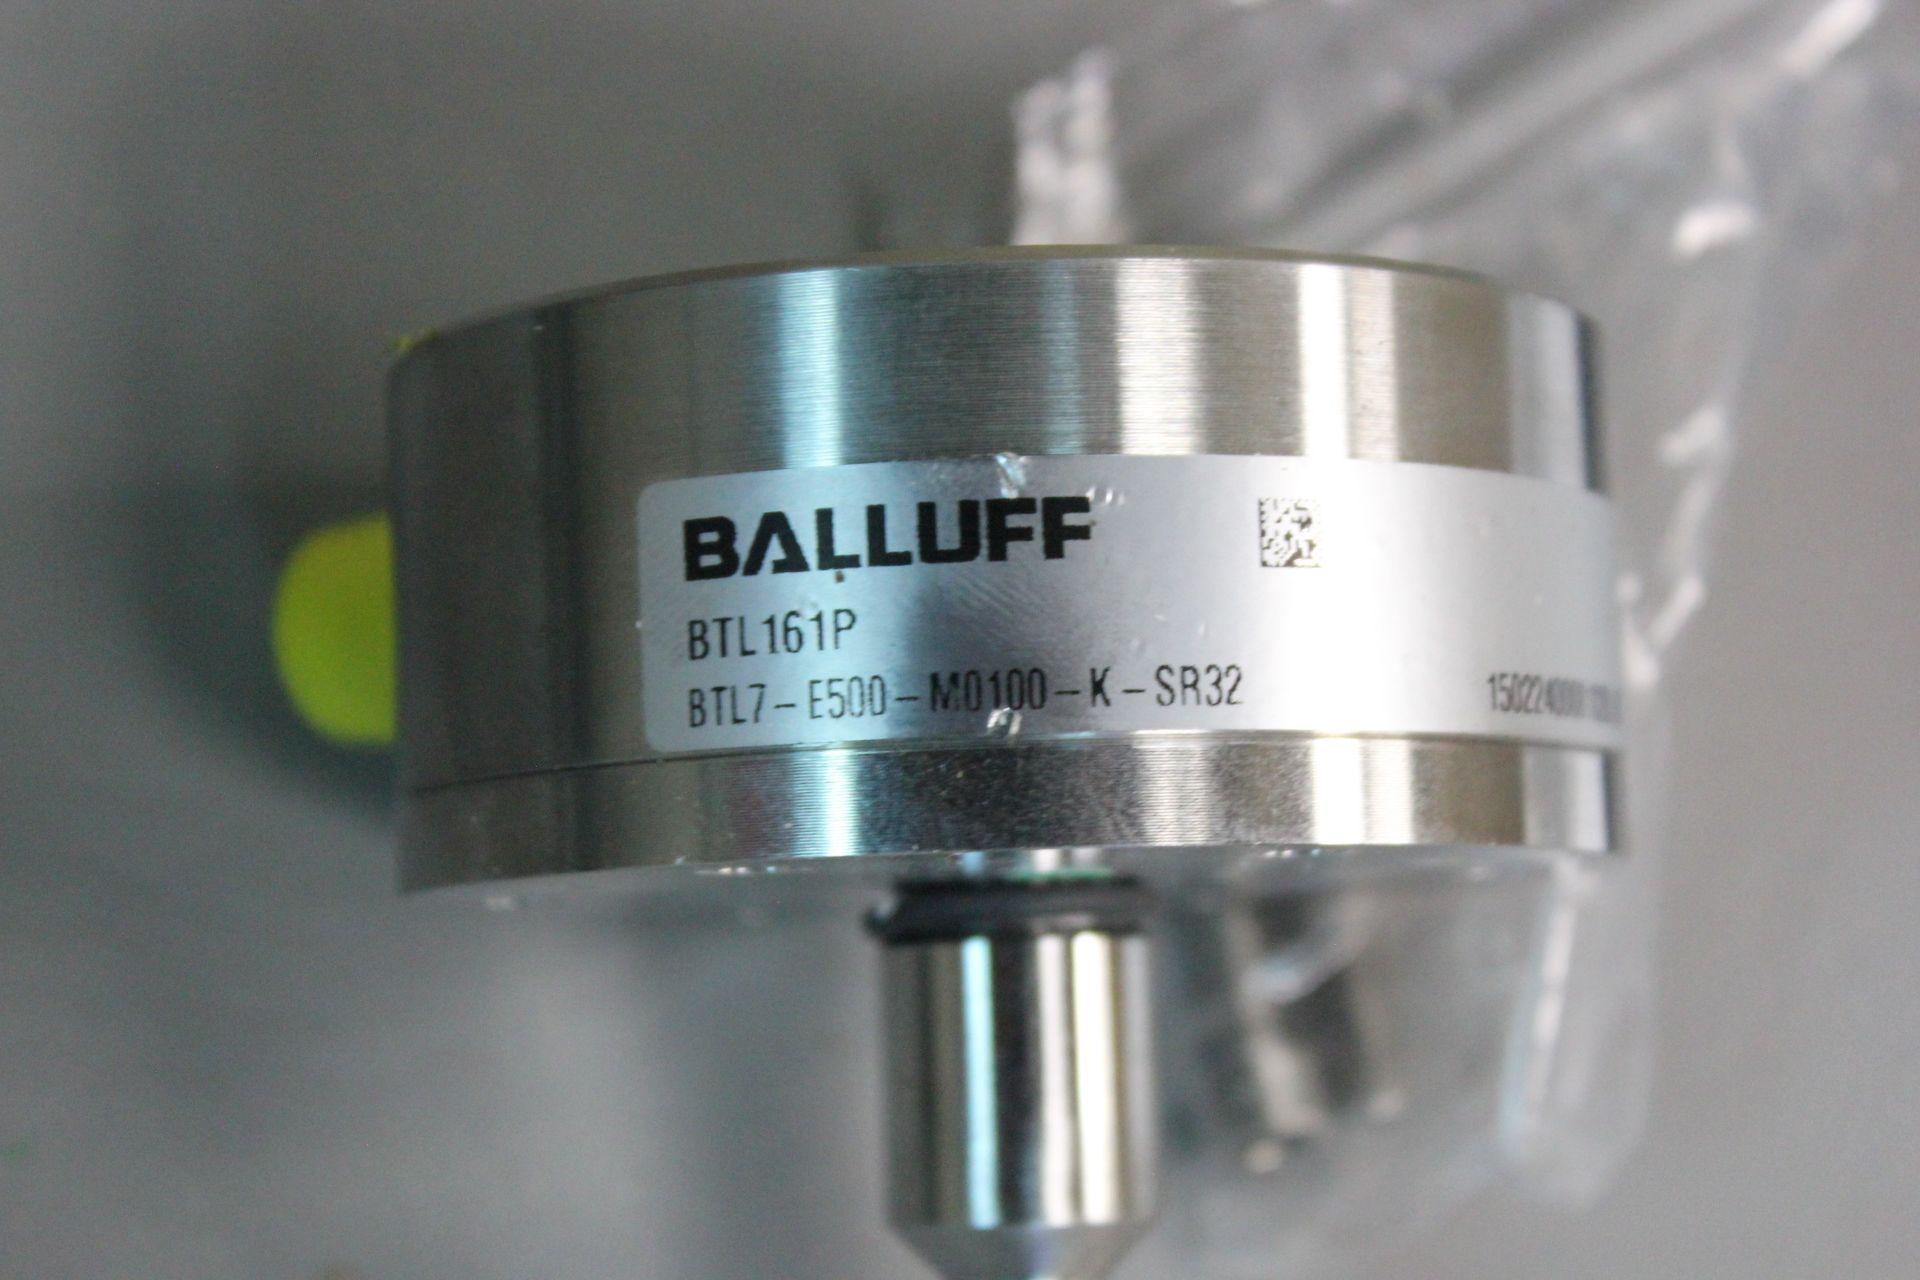 NEW BALLUFF MICROPULSE MAGNETOSTRICTIVE LINEAR POSITION SENSOR - Image 5 of 6